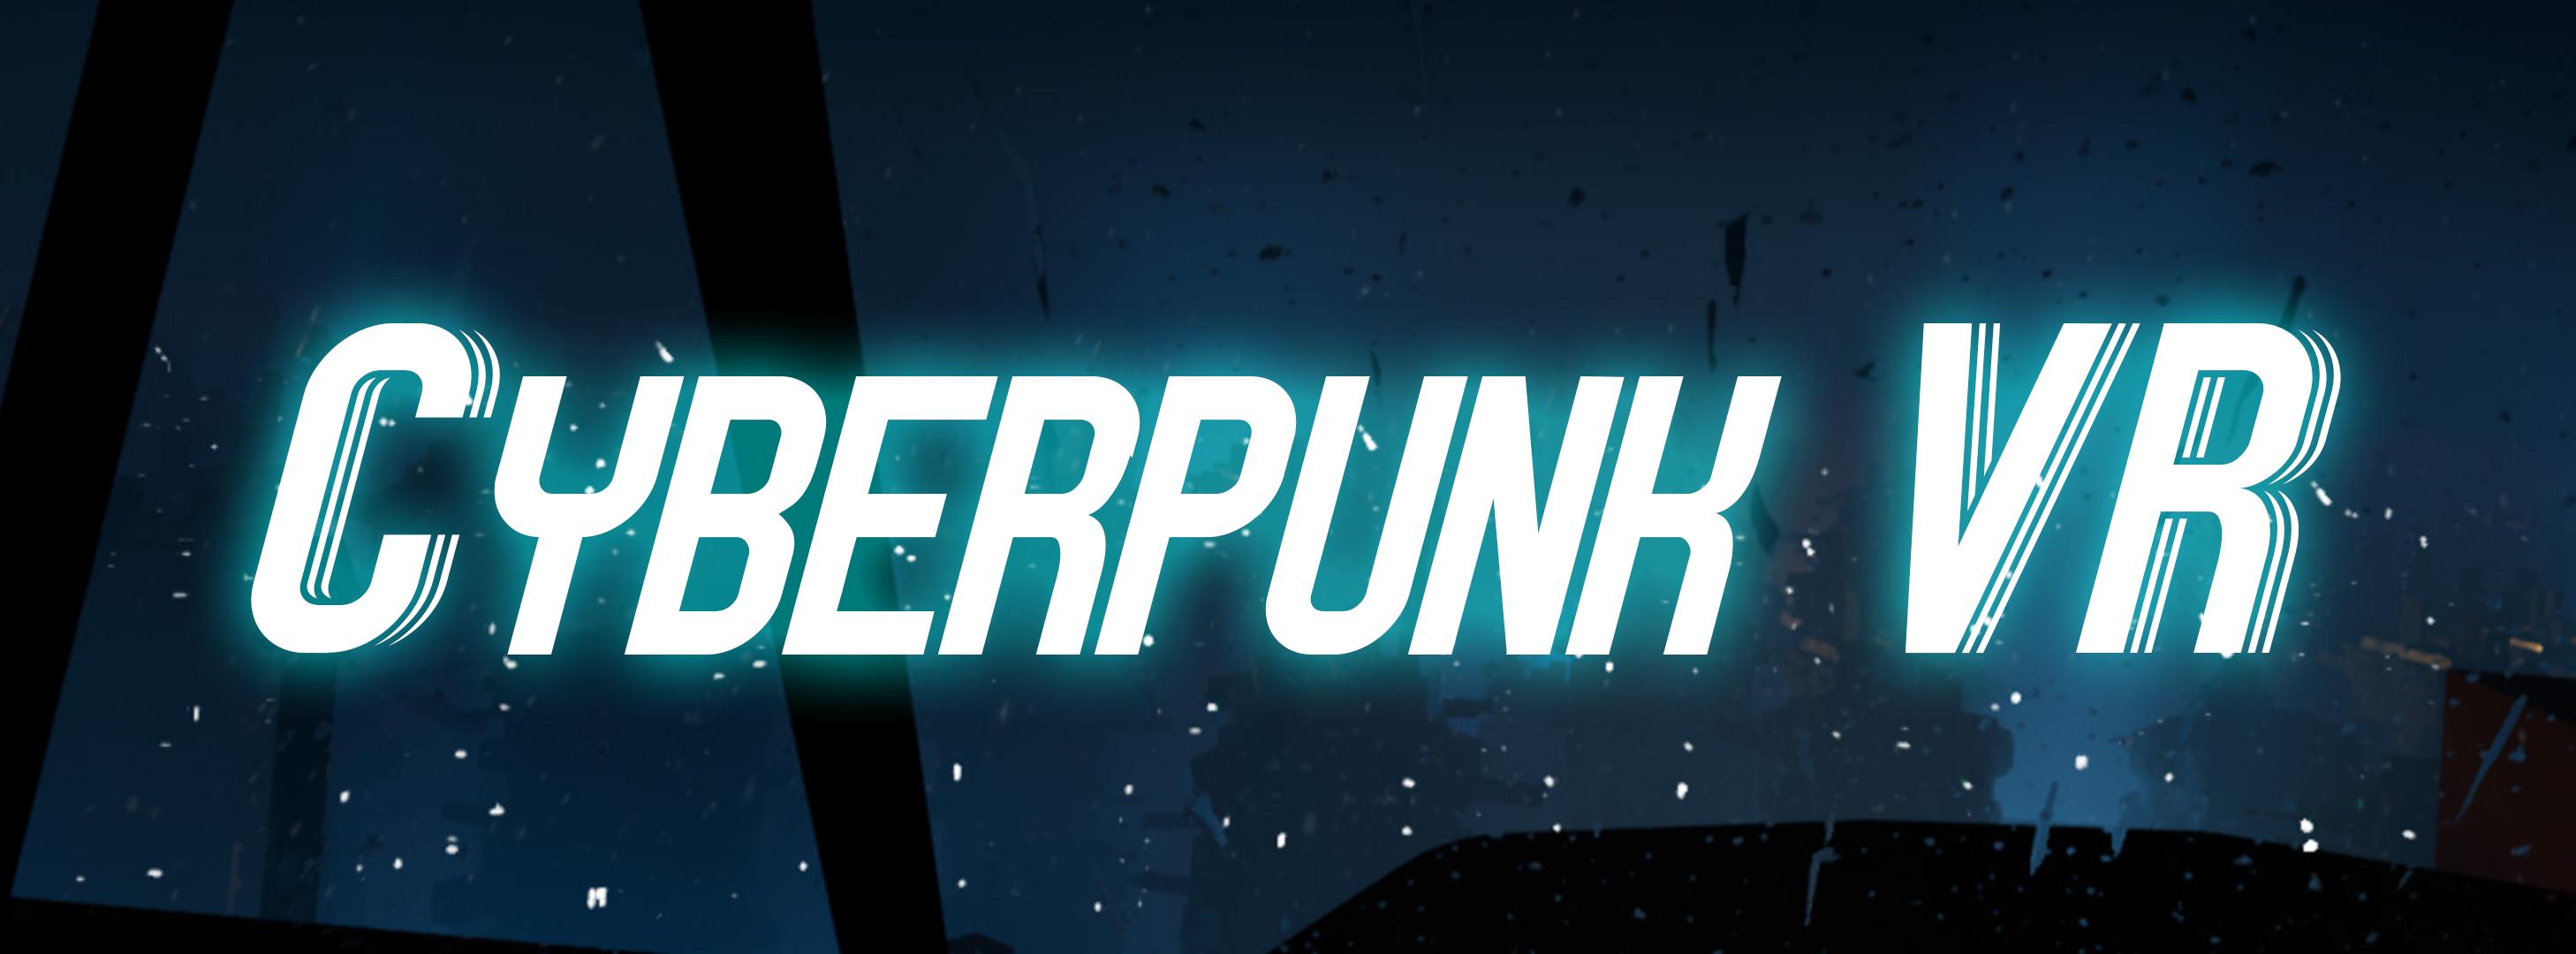 Cyberpunk VR Experience